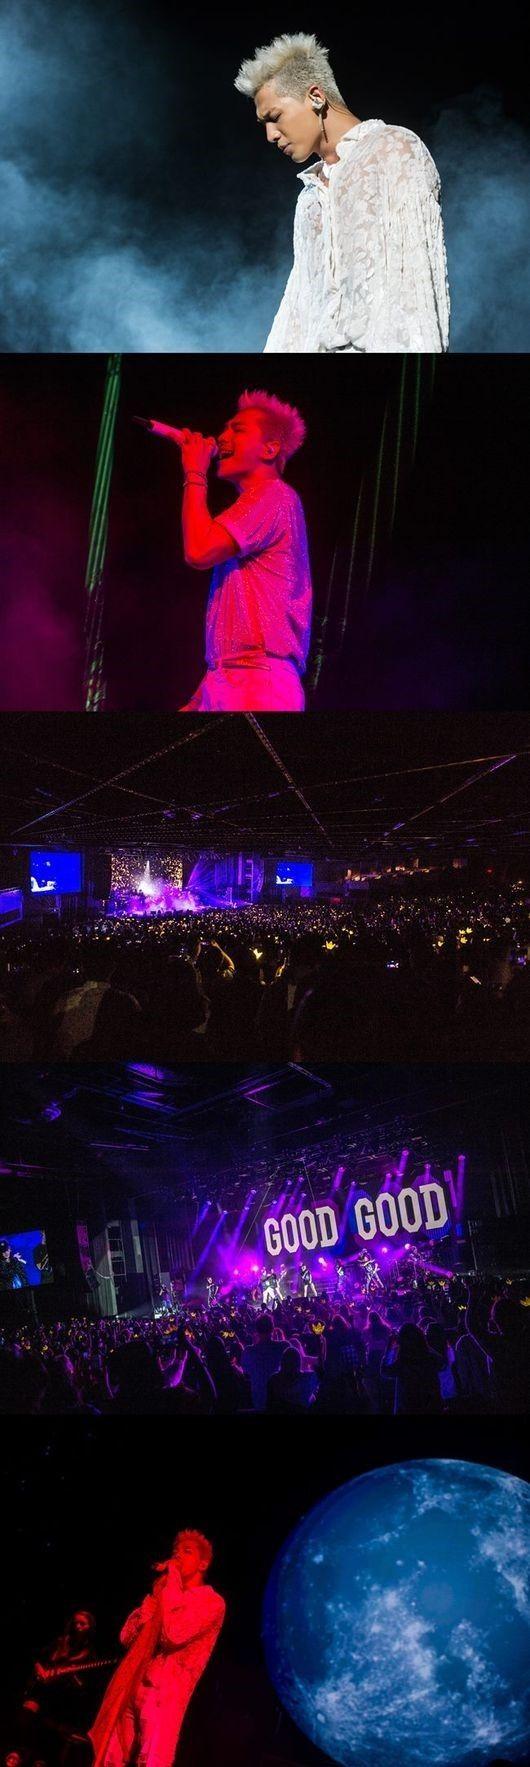 【BIGBANG NEWS】BIGBANGのSOL、ニューヨーク公演で華やかなステージを披露…特別なファンサービスにファン歓喜